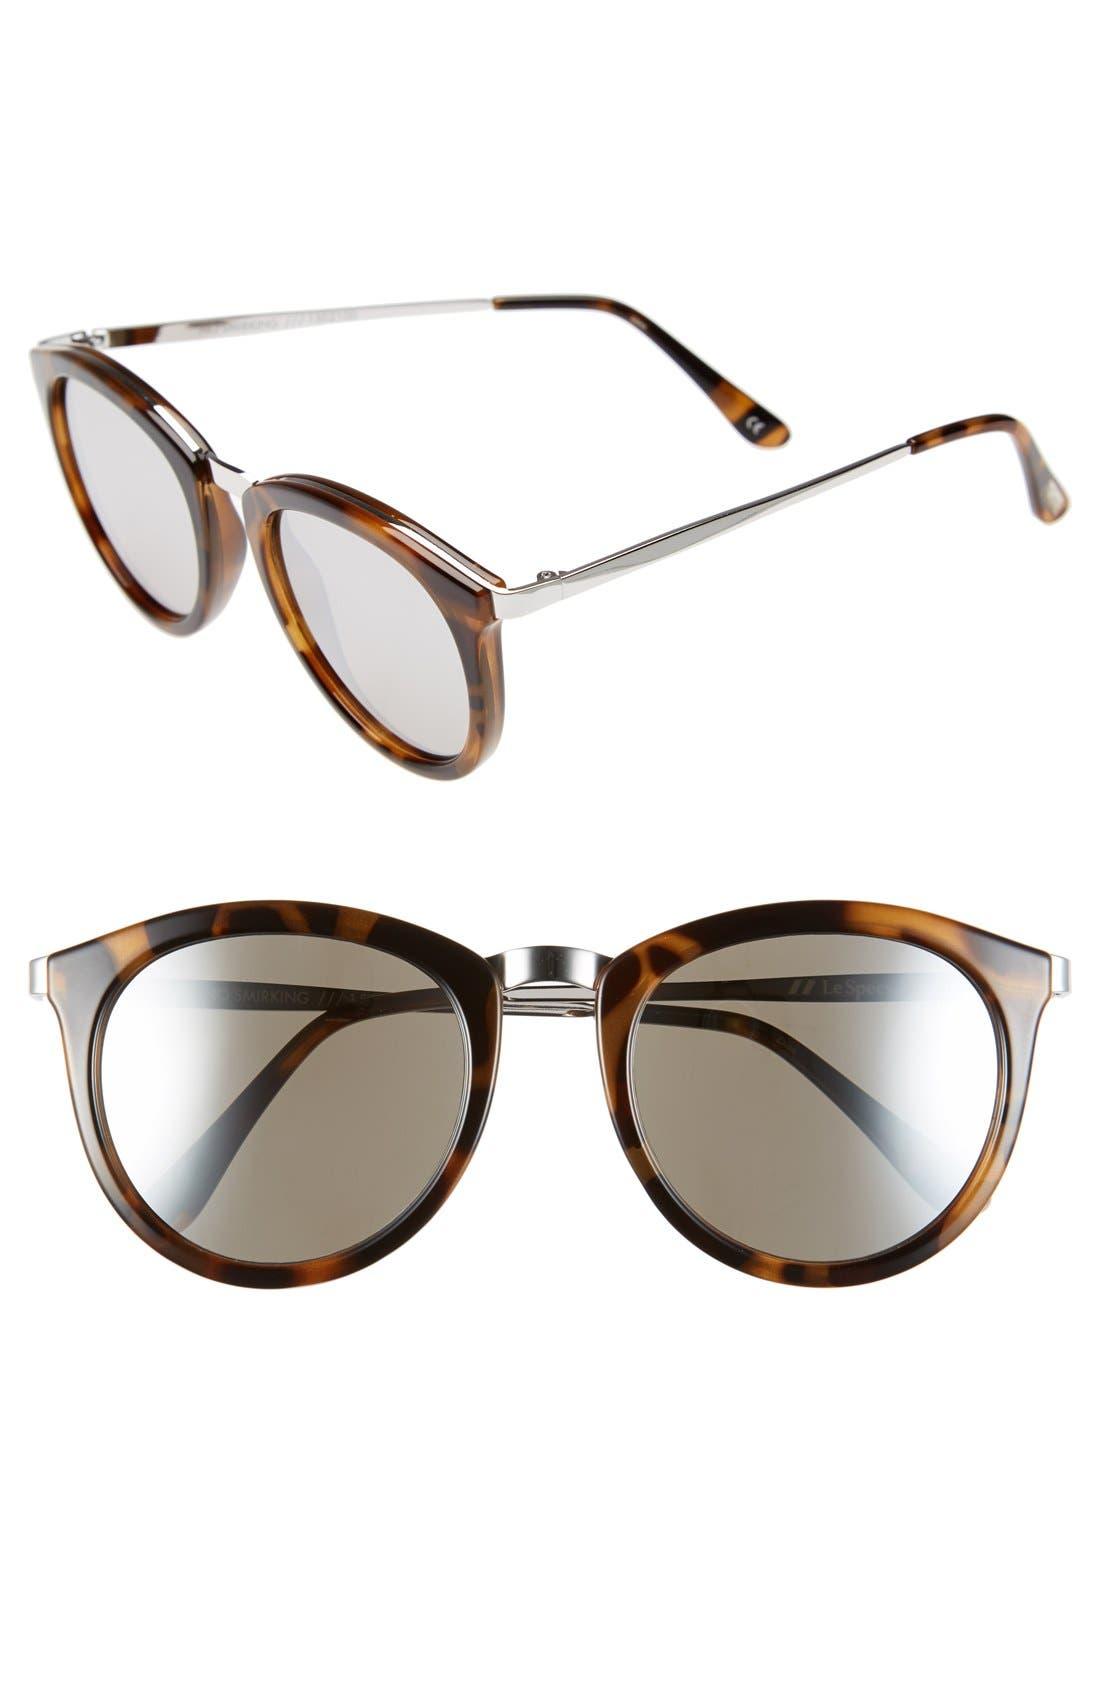 Alternate Image 1 Selected - Le Specs 'No Smirking' 50mm Round Sunglasses